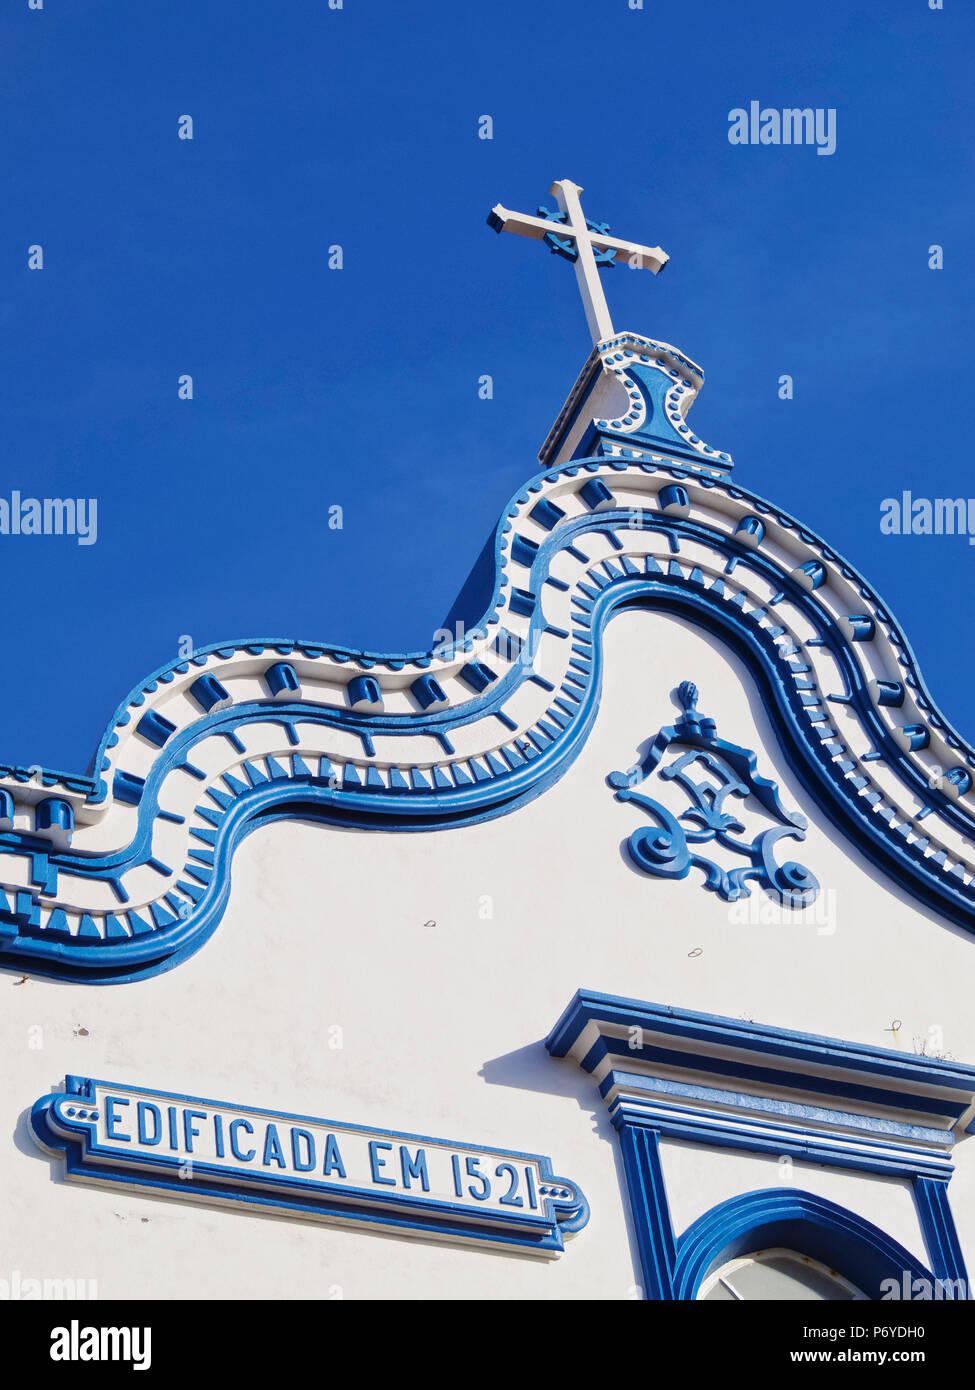 Portugal, Azores, Terceira, Praia da Vitoria, Detailed view of the Santo Cristo Church. - Stock Image